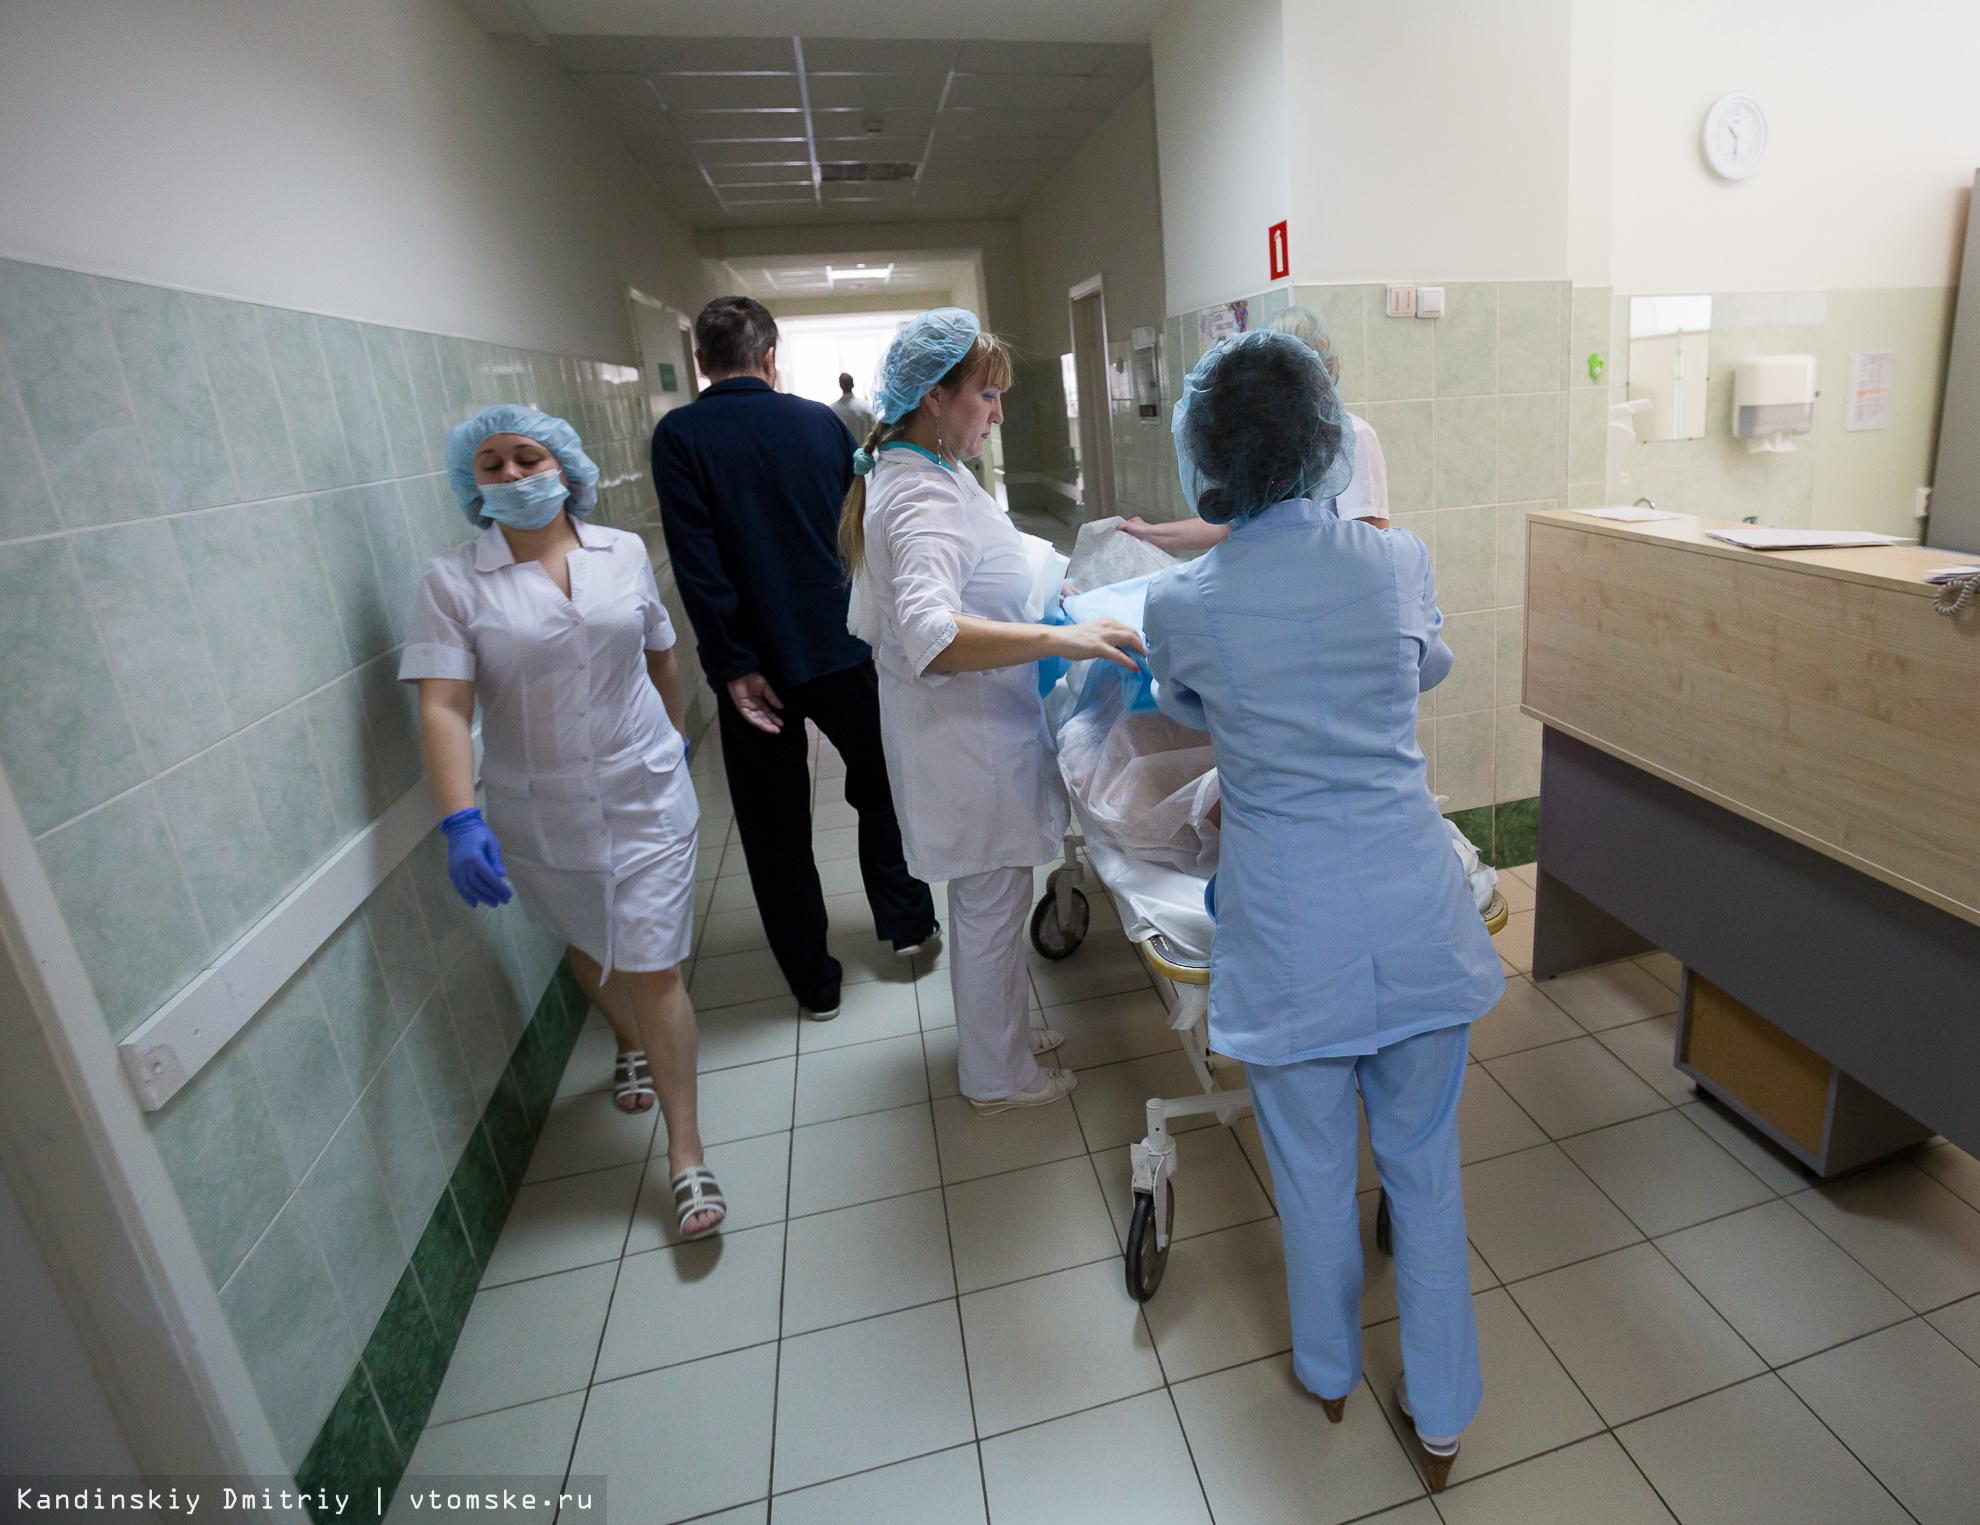 Буланов м и врач во владимире